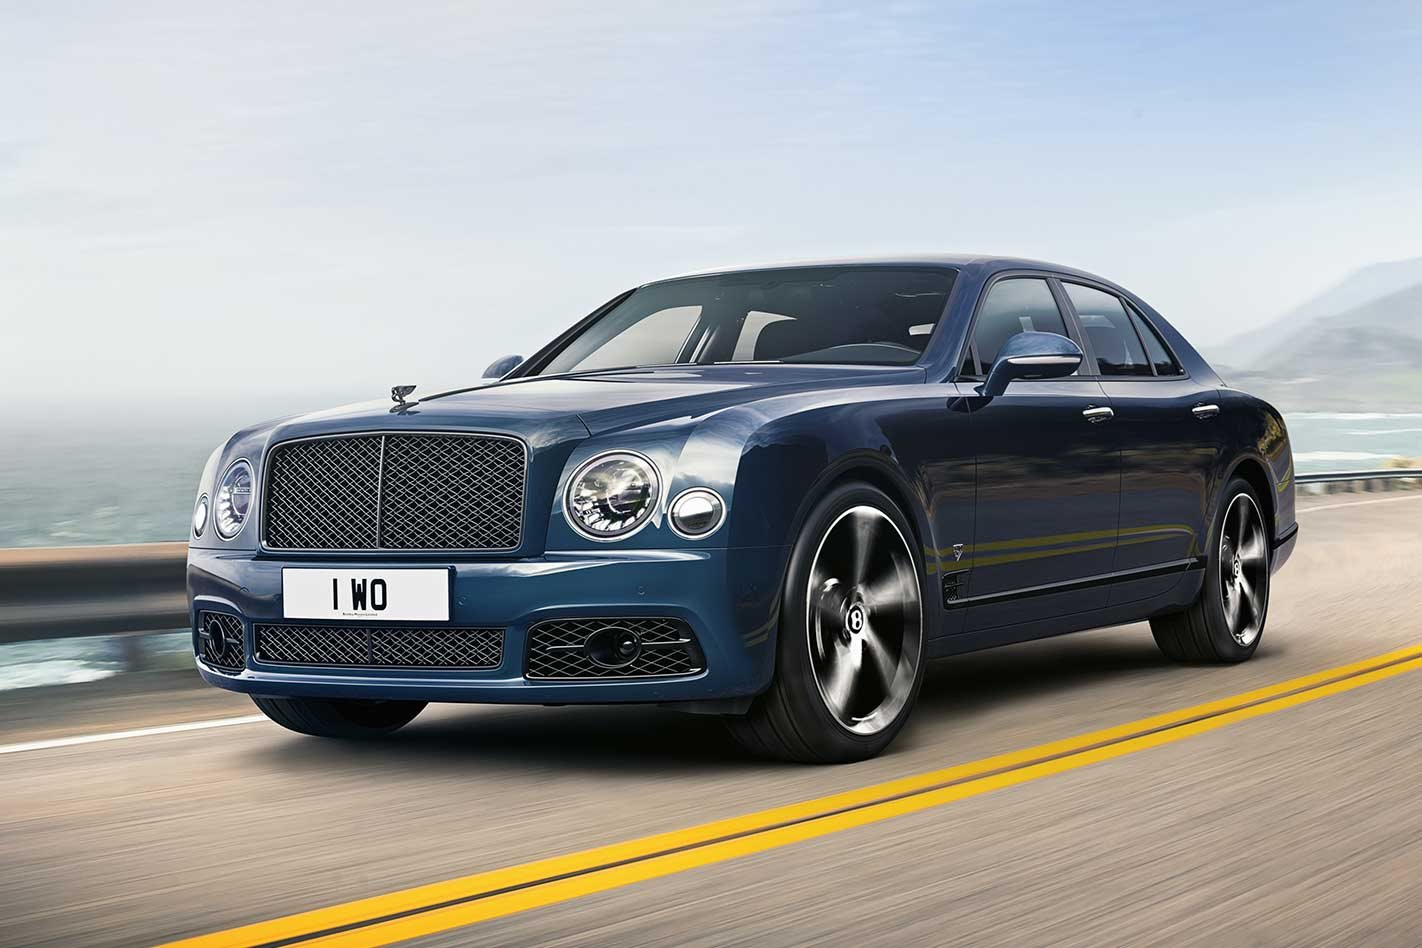 Bentley Mulsanne 6.75 Edition farewells flagship and Rolls-Royce V8